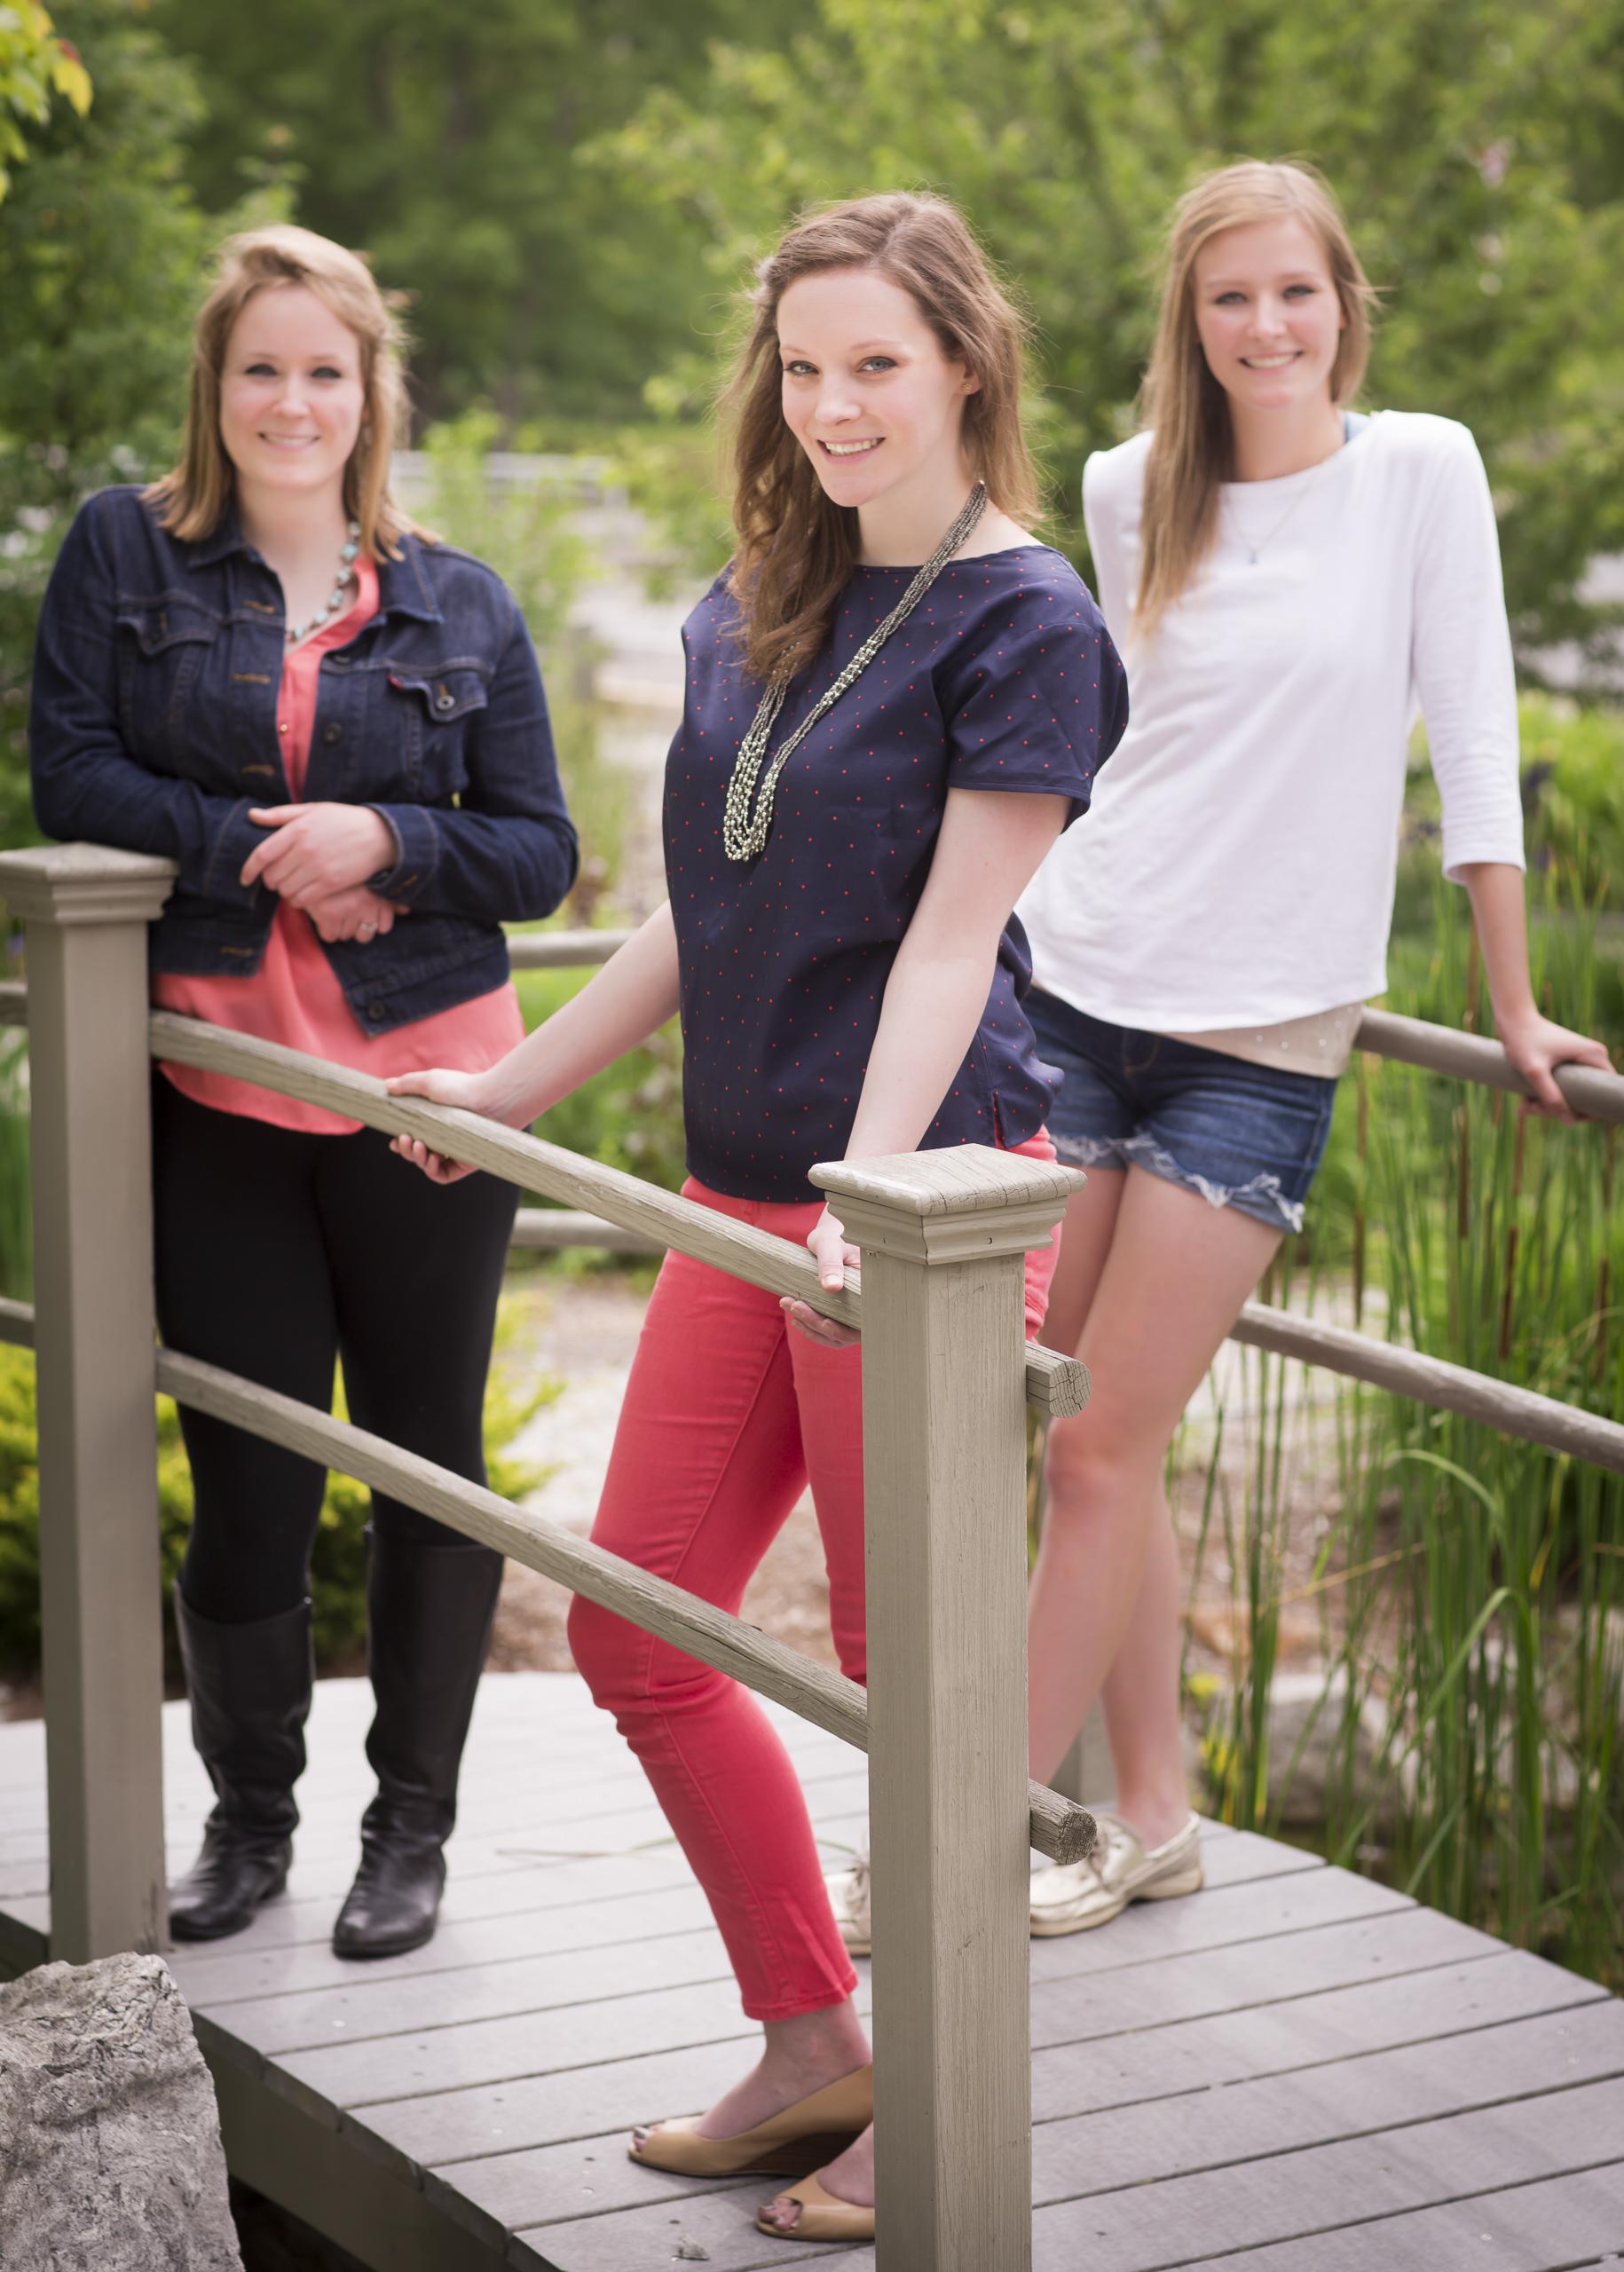 05 3 sisters family portrait outdoor session on bridge.jpg